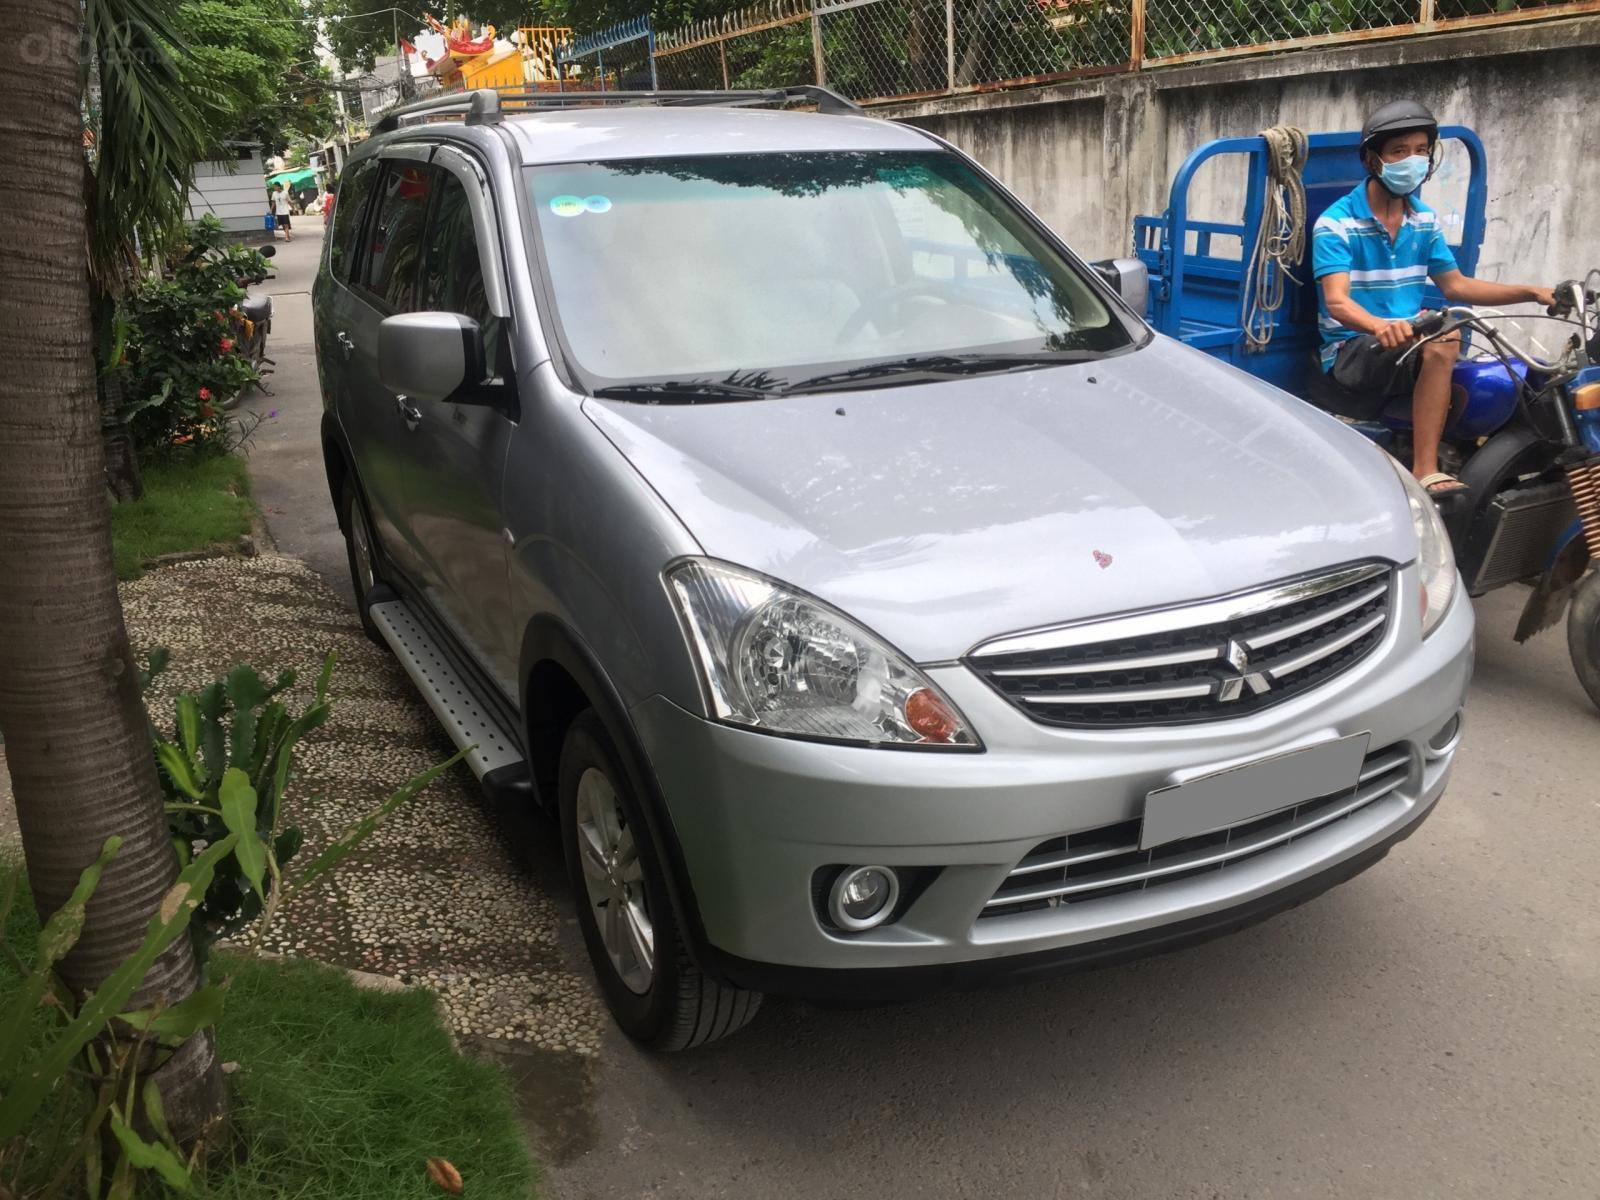 nen-mua-xe-cu-gi-voi-tam-tien-350-de-khoi-nghiep-ma-khong-phai-vay-ngan-hang